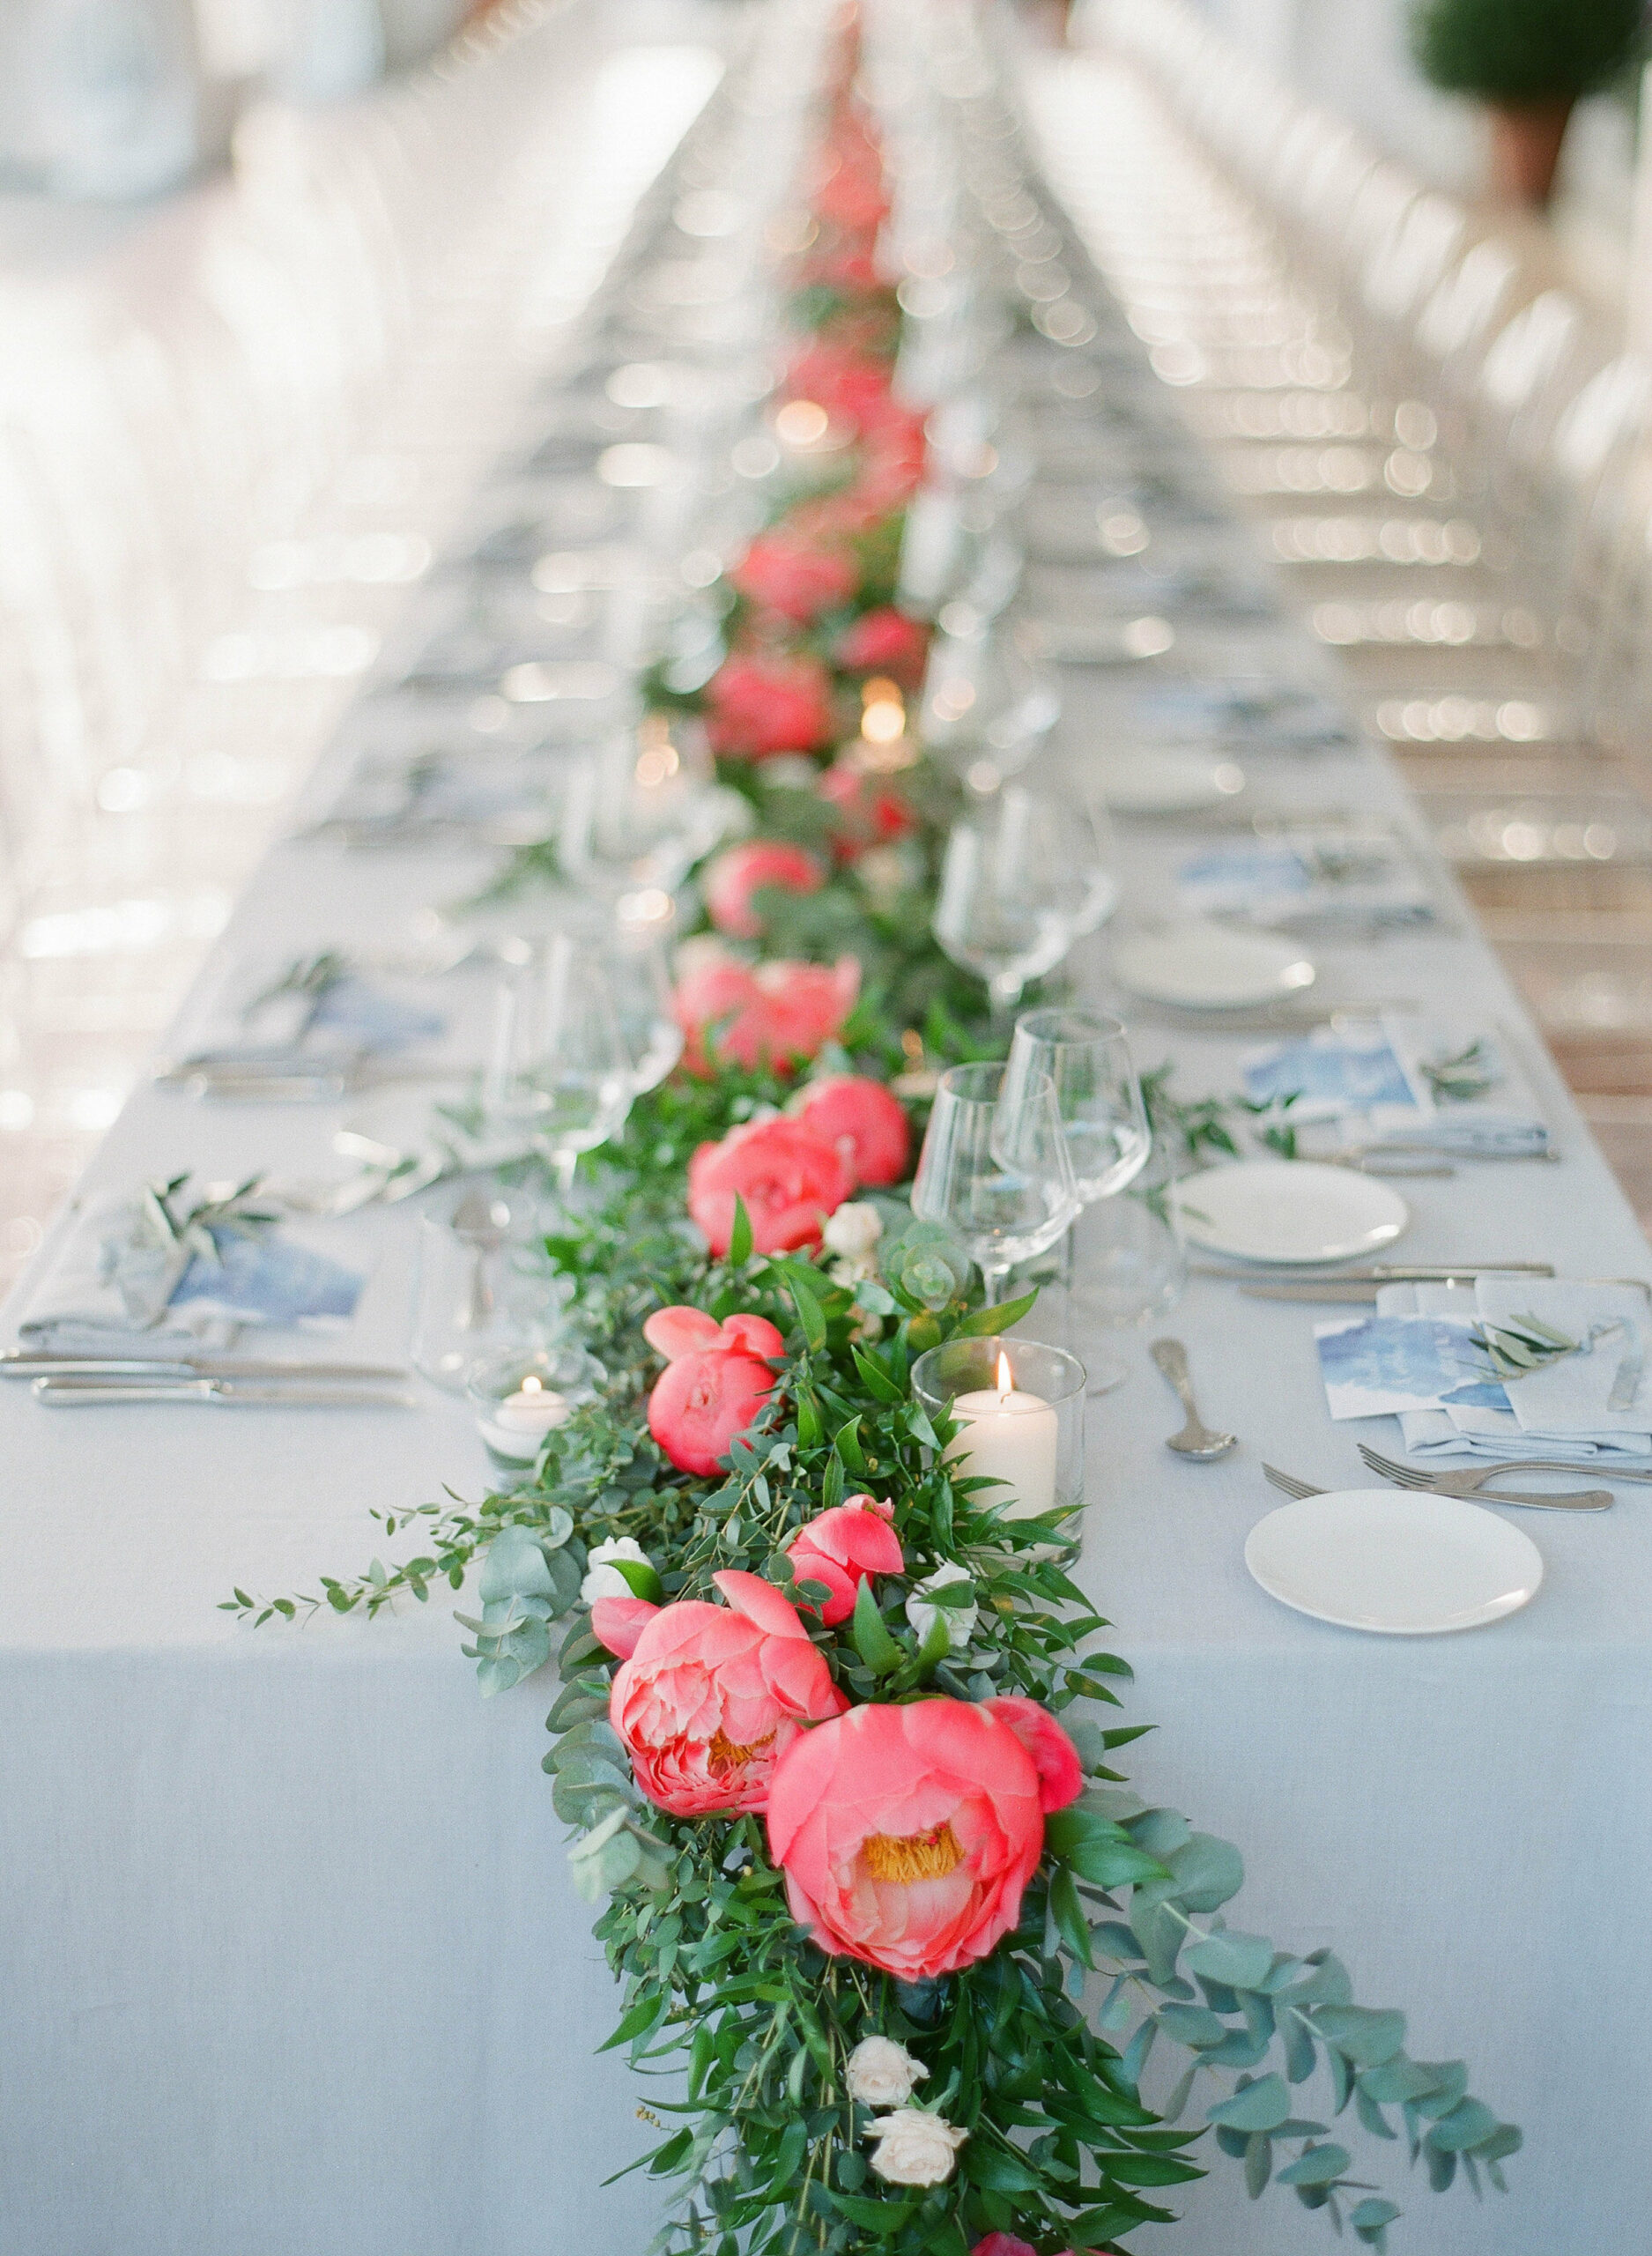 Seaside wedding at Belles Rives